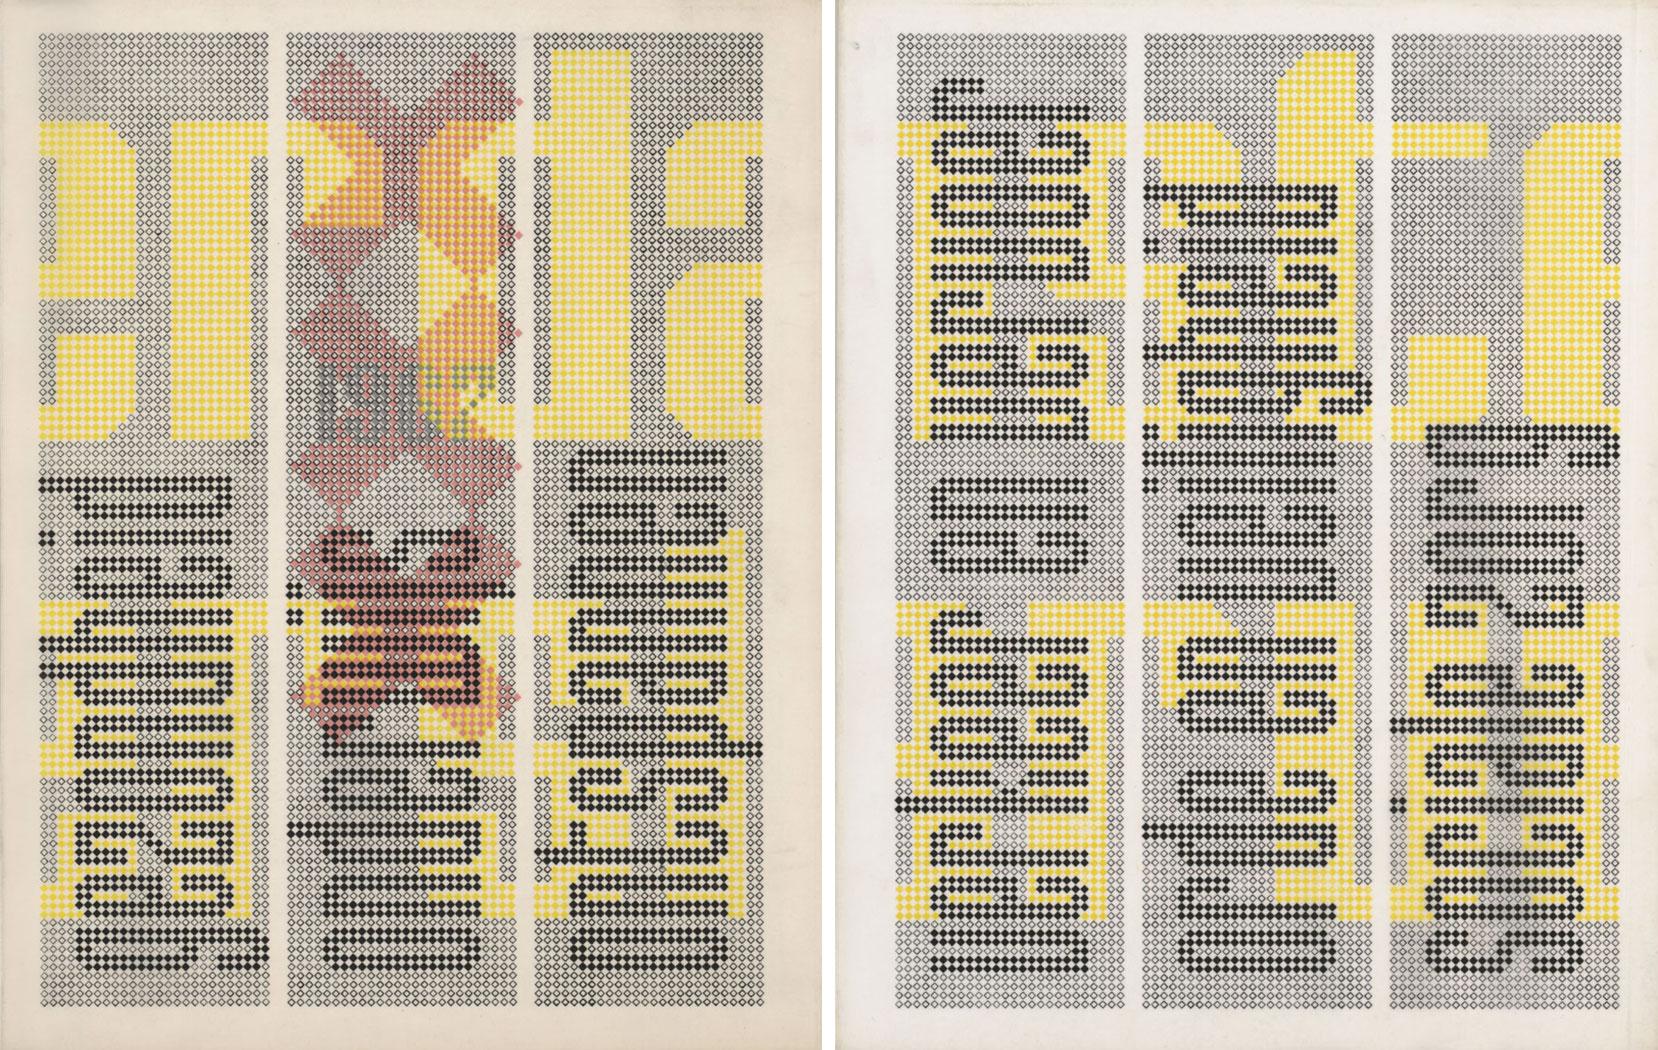 Jurriaan-Schrofer-Amsterdam-jaarverslag-1968